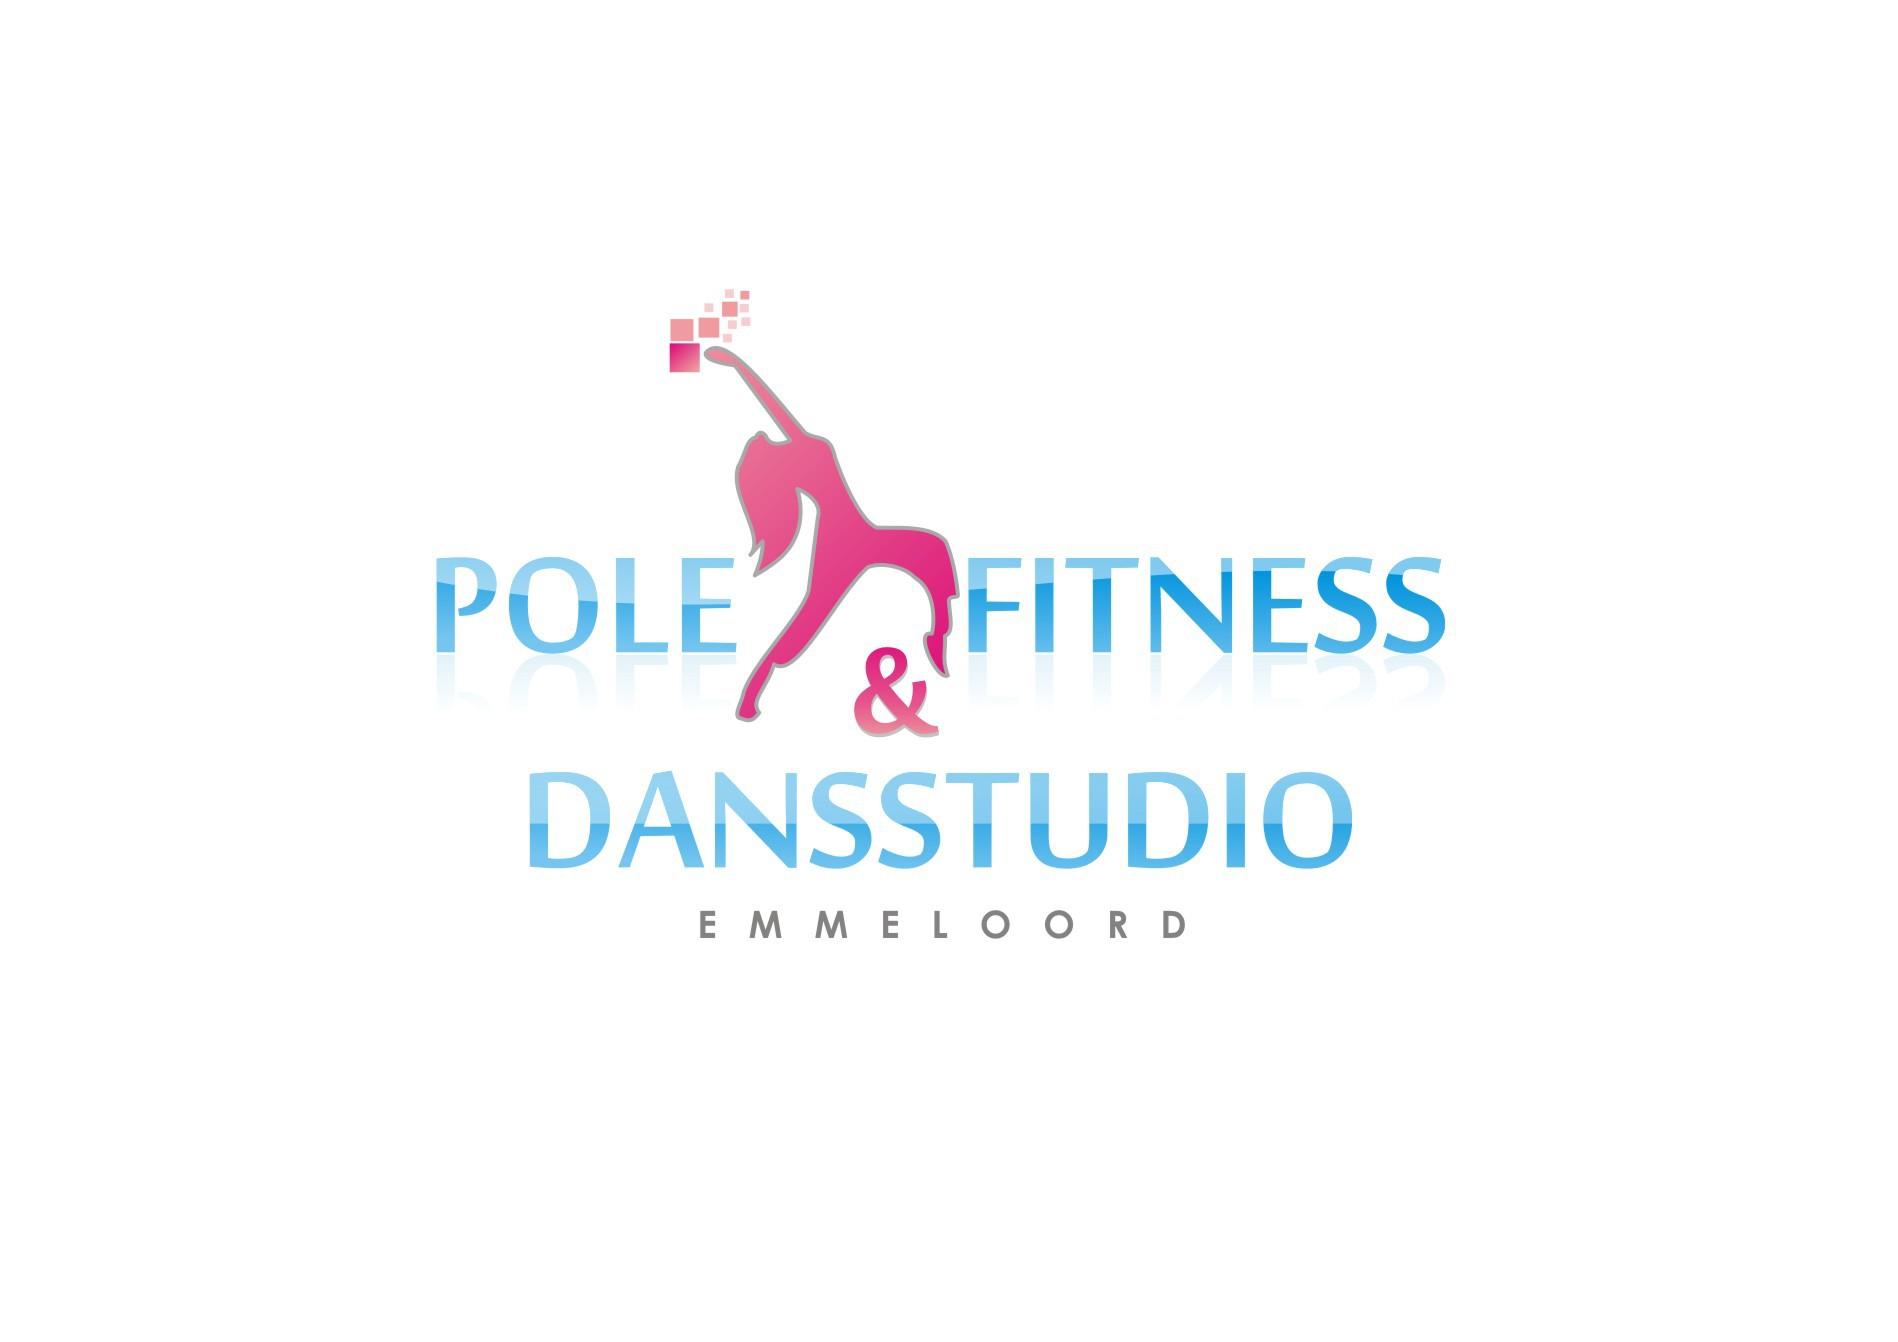 Help Pole Fitness & Dansstudio Emmeloord with a new logo